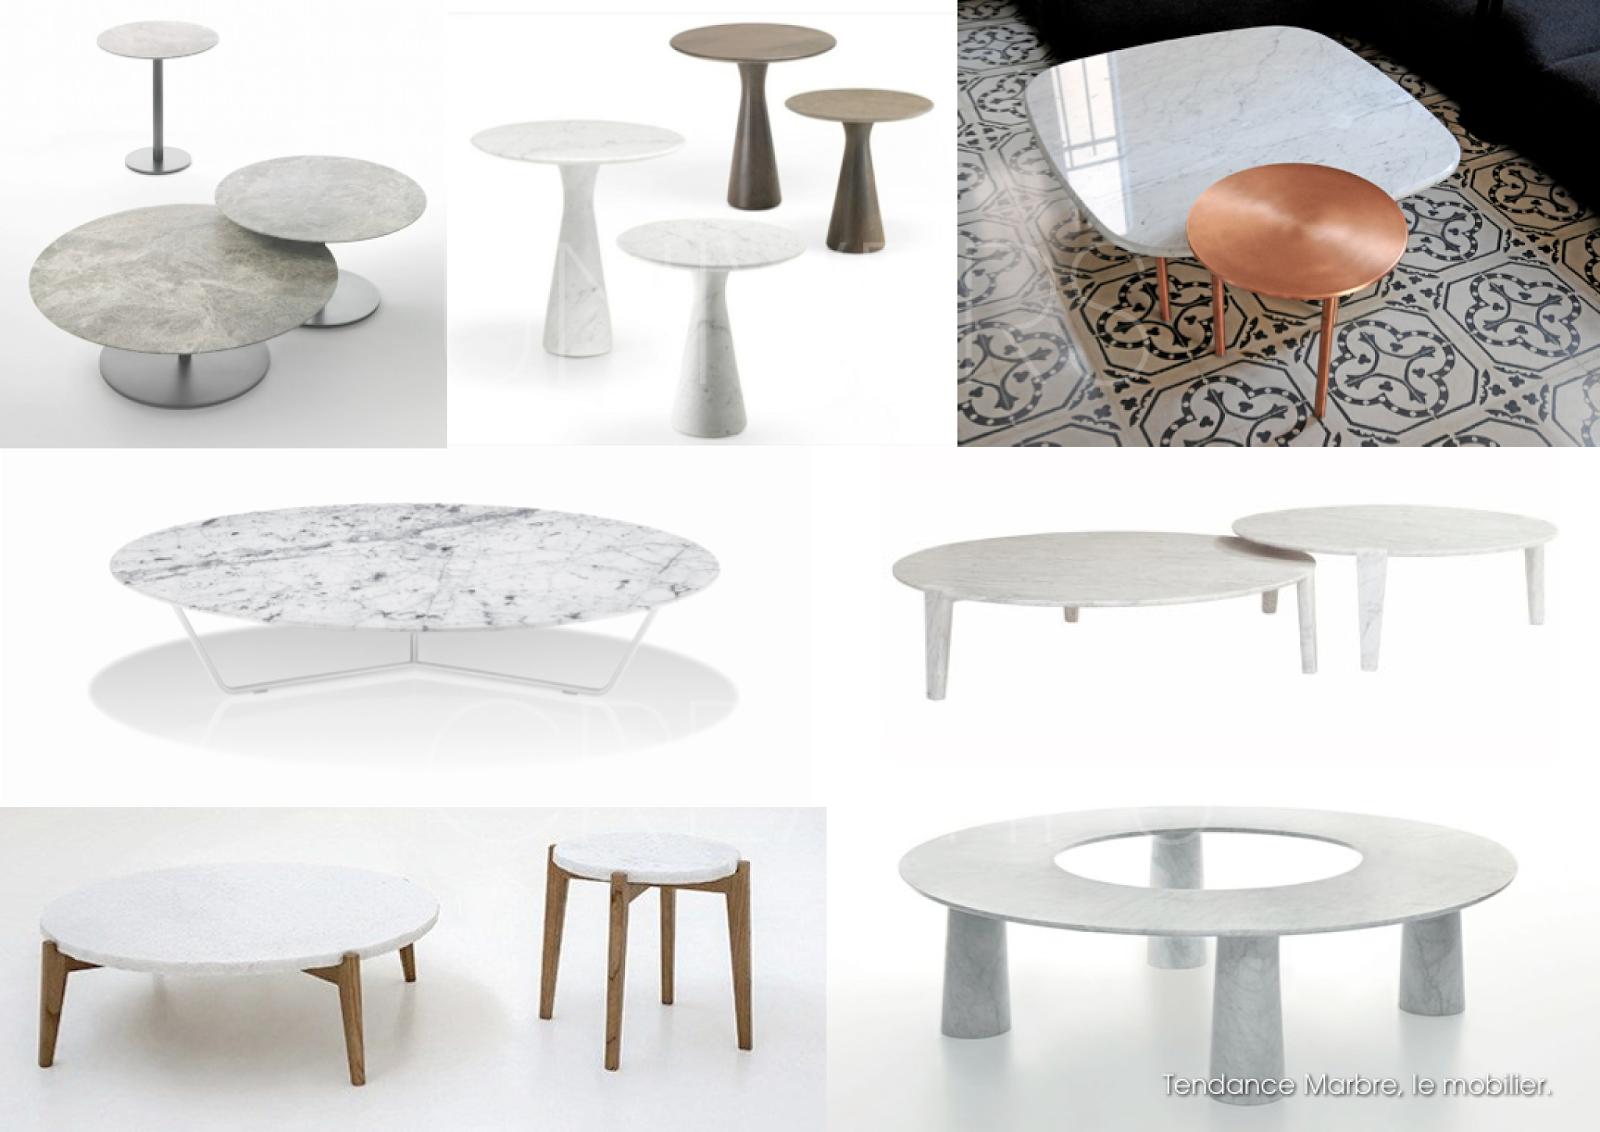 univers creatifs tendance marbre 2 mobilier les tables basses. Black Bedroom Furniture Sets. Home Design Ideas